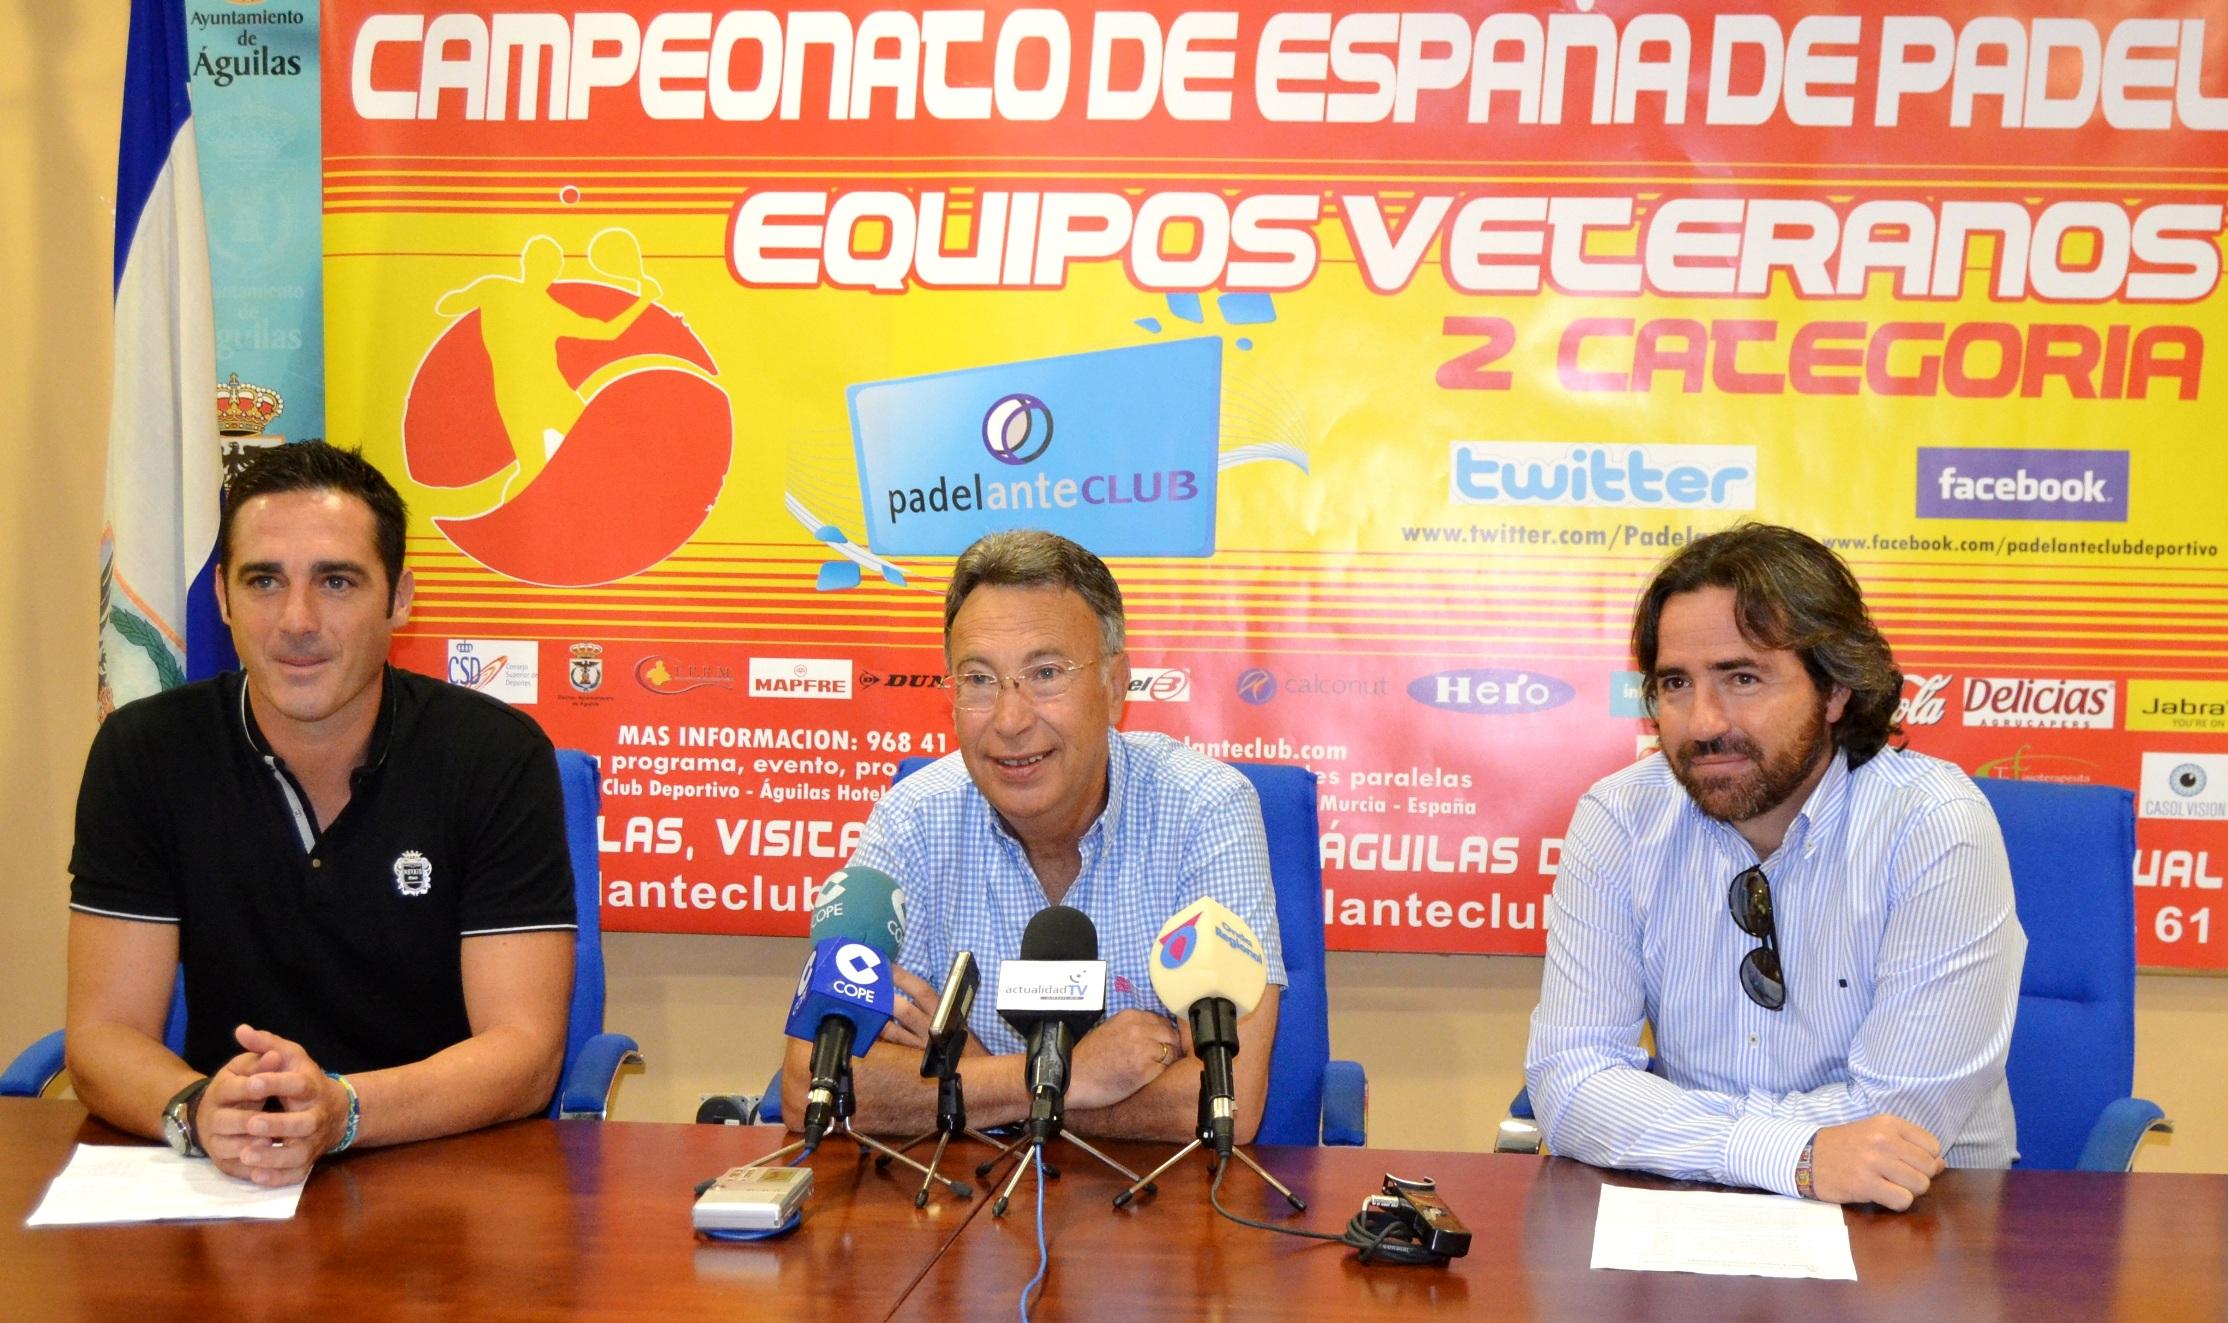 Presentacion Campeonato Espana Padel